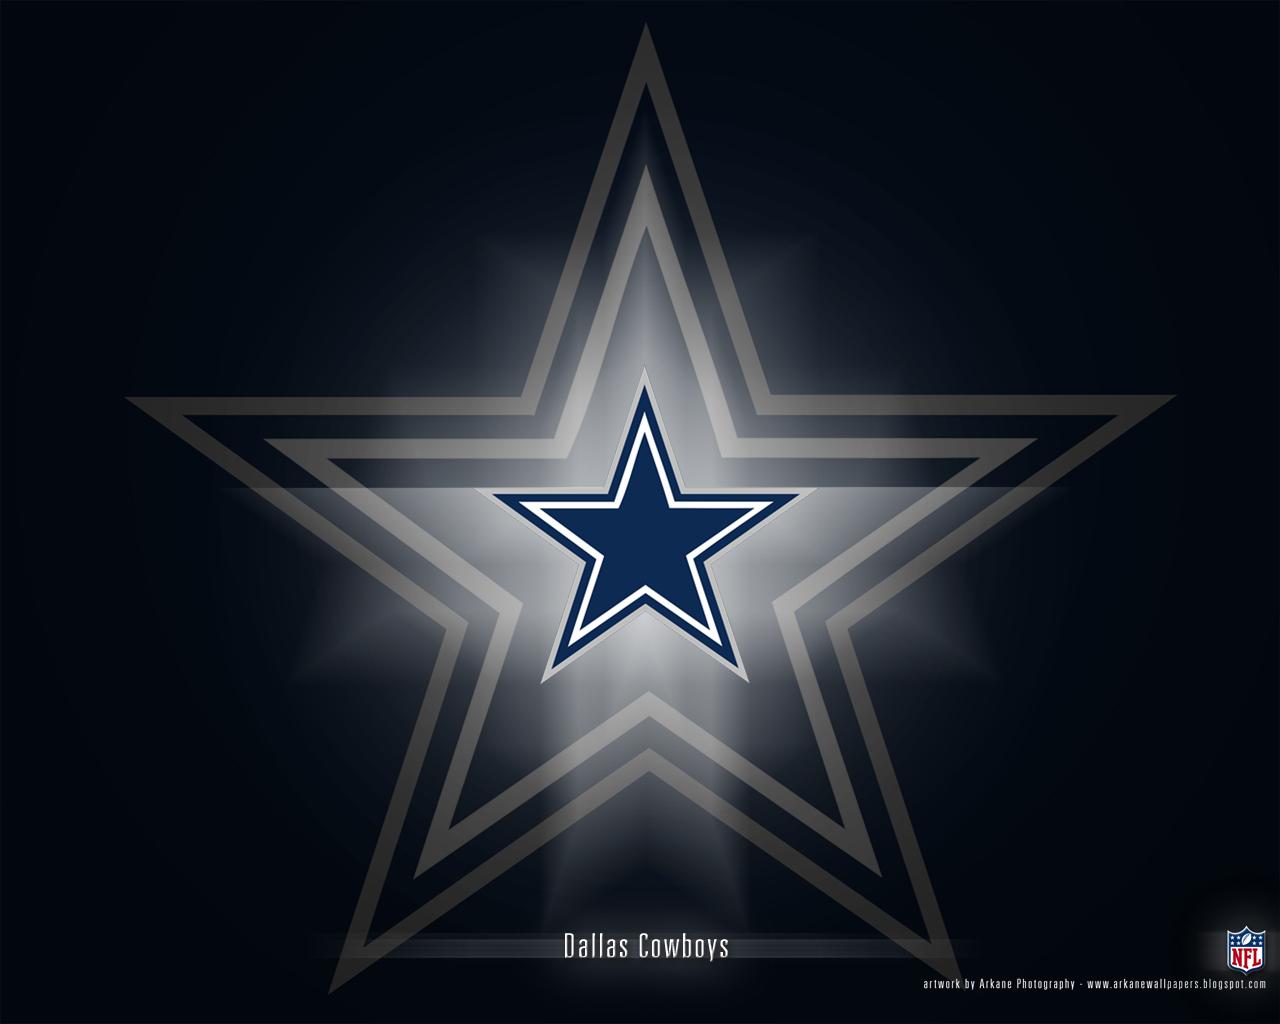 Dallas Cowboys wallpapers, Sports, HQ